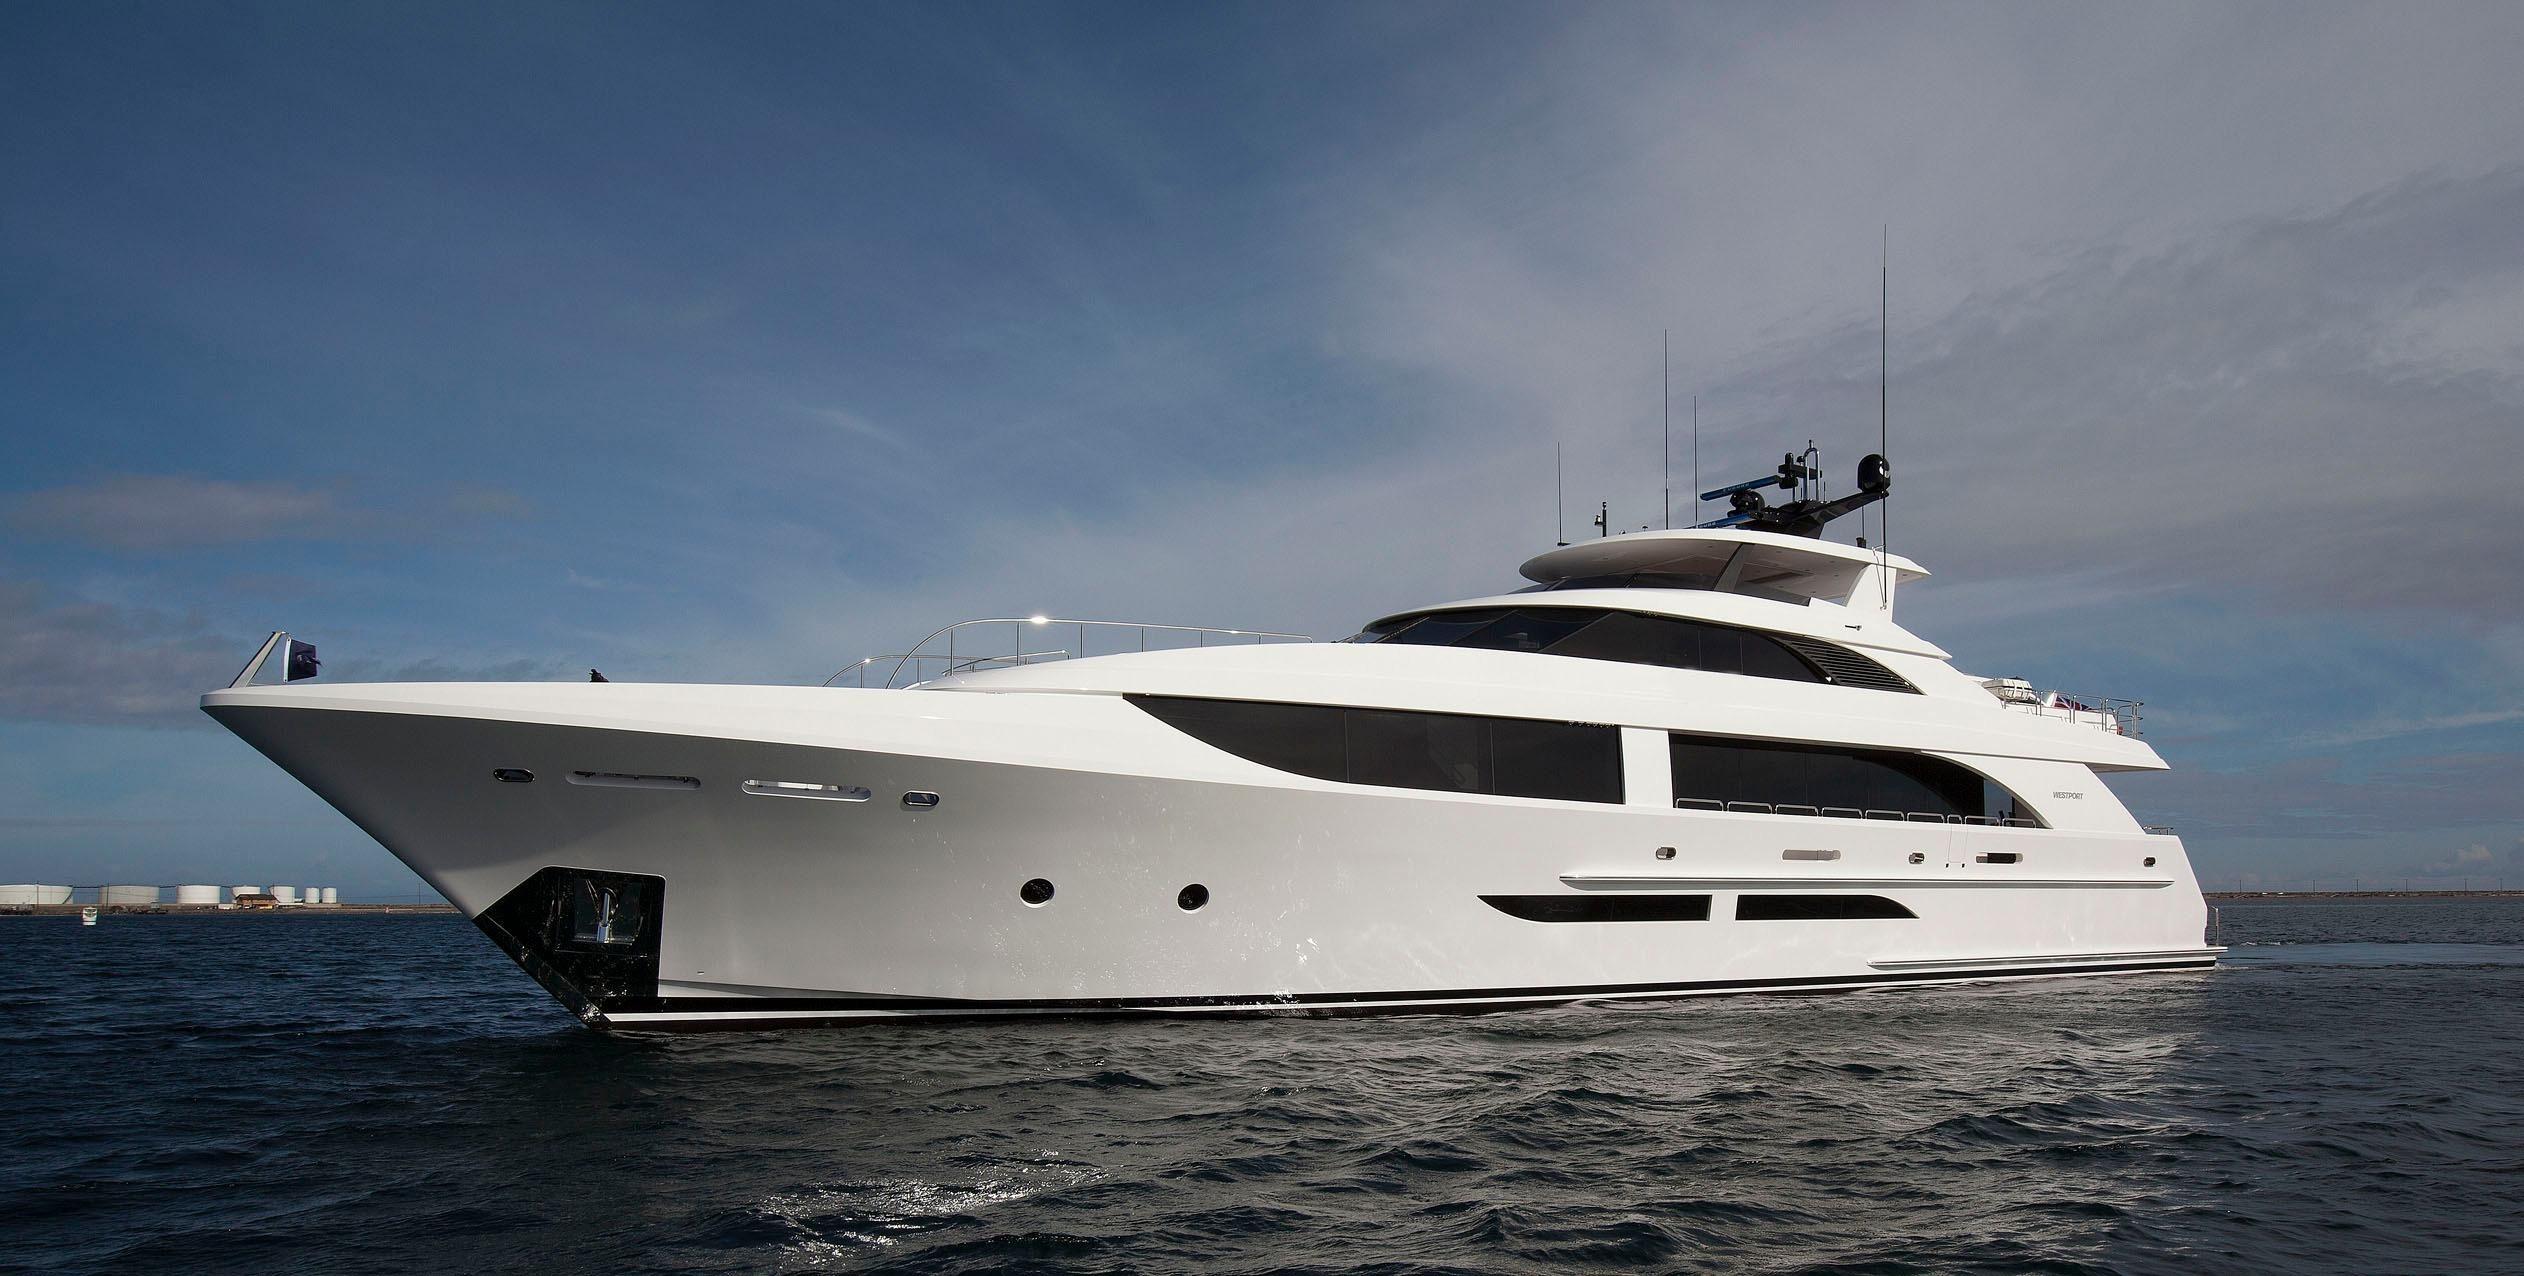 2020 Westport 125 38 Meter Power Boat For Sale Www Yachtworld Com